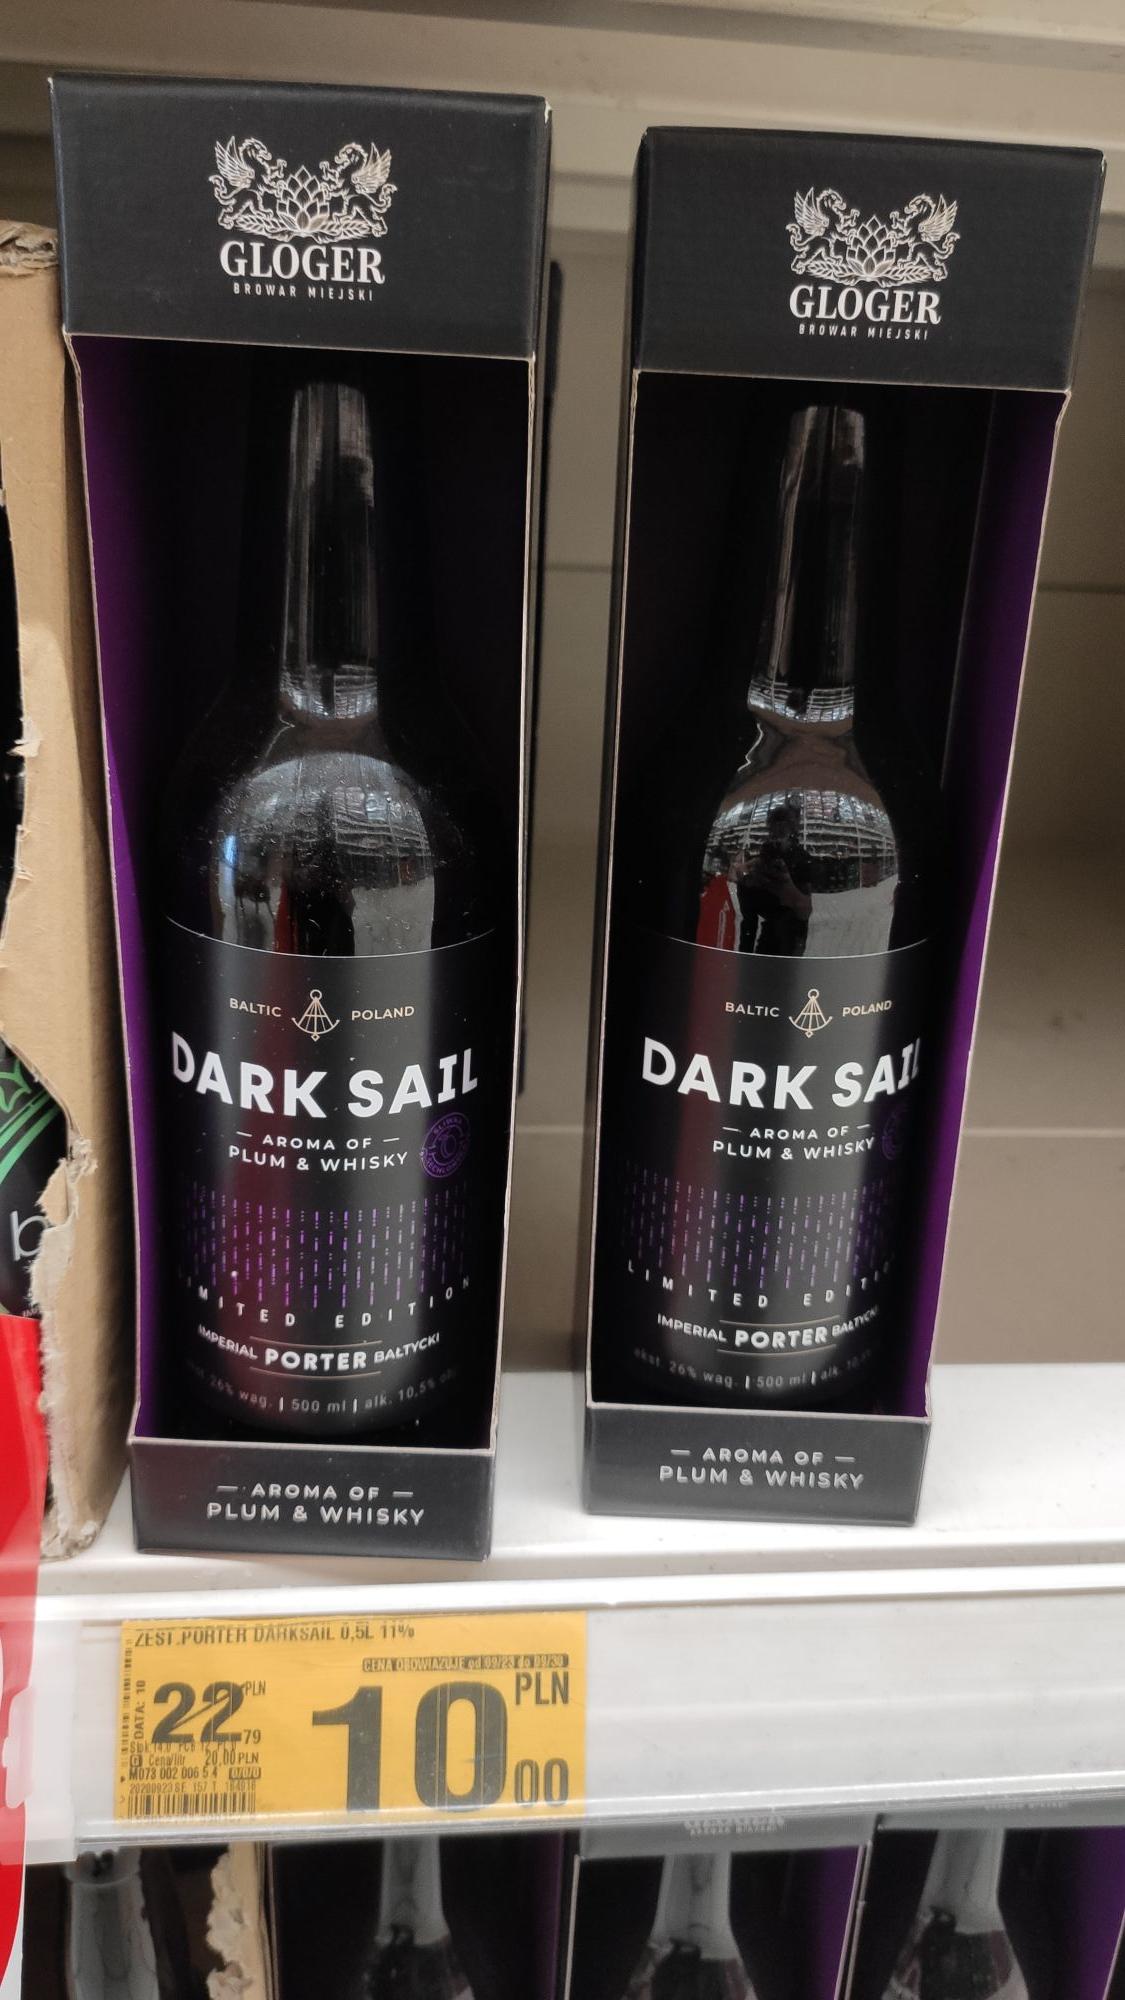 Porter Bałtycki Dark Sail